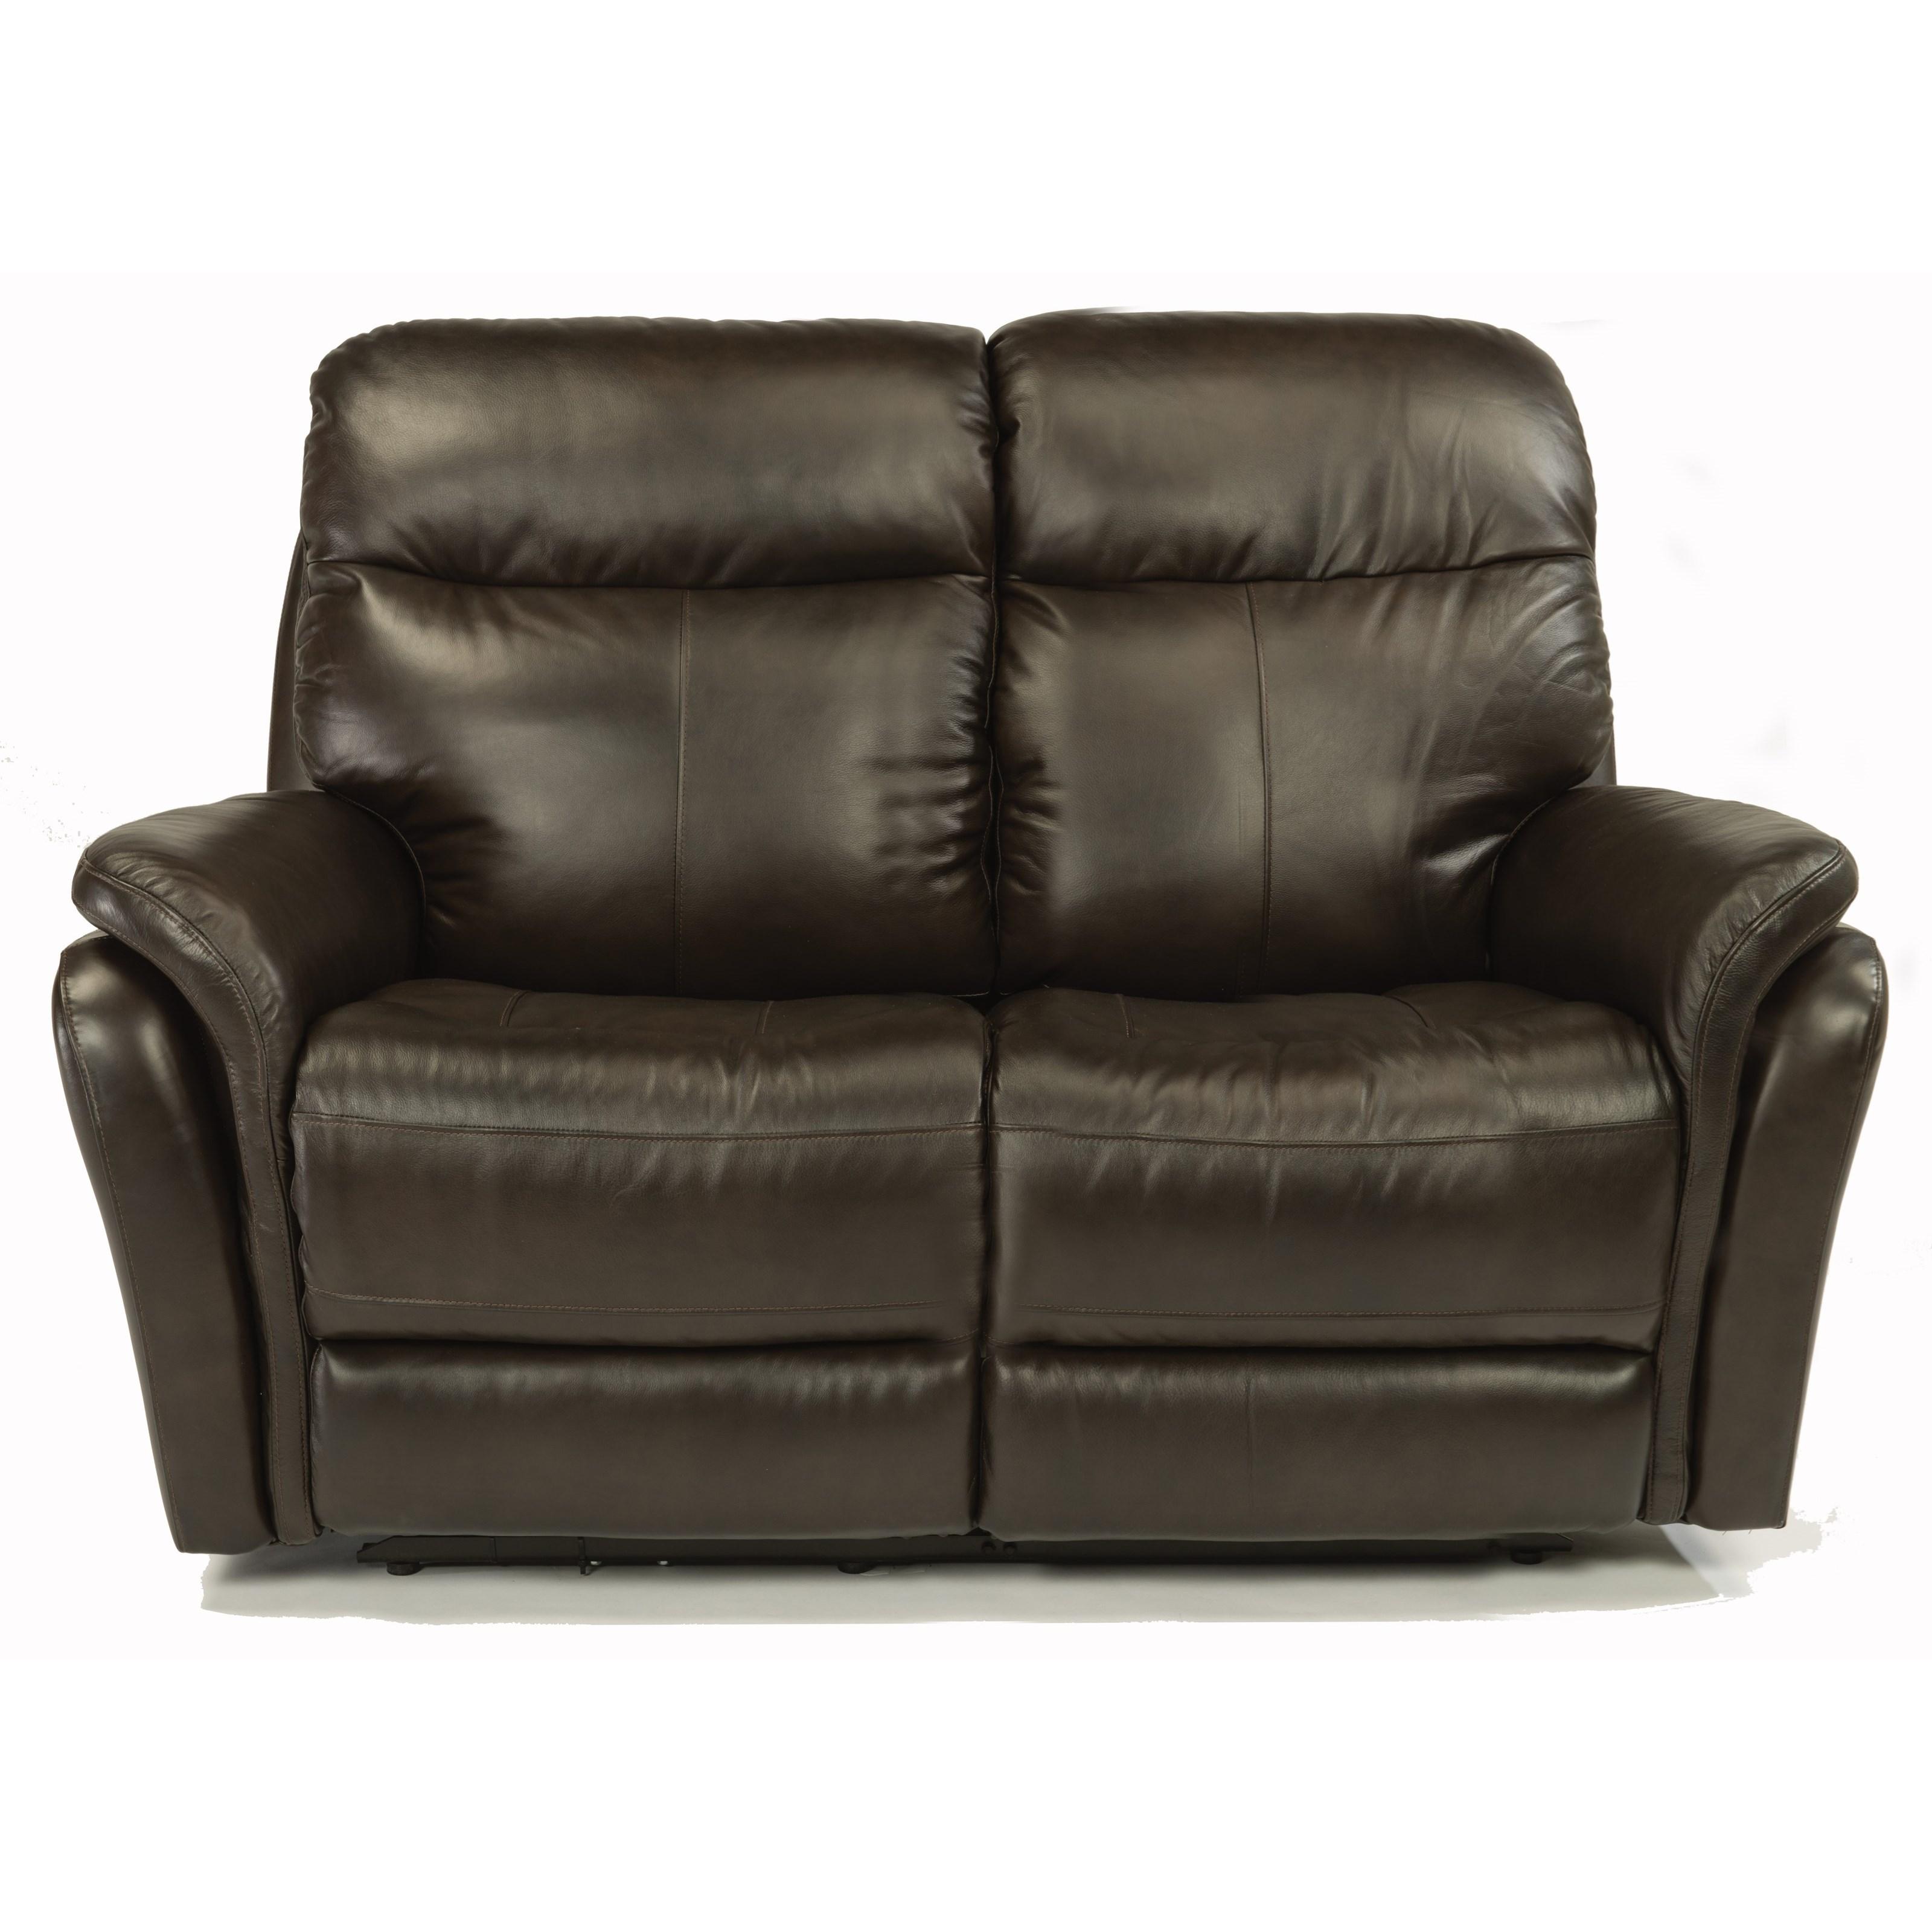 Power Reclining Love Seat w/ Power Headrest